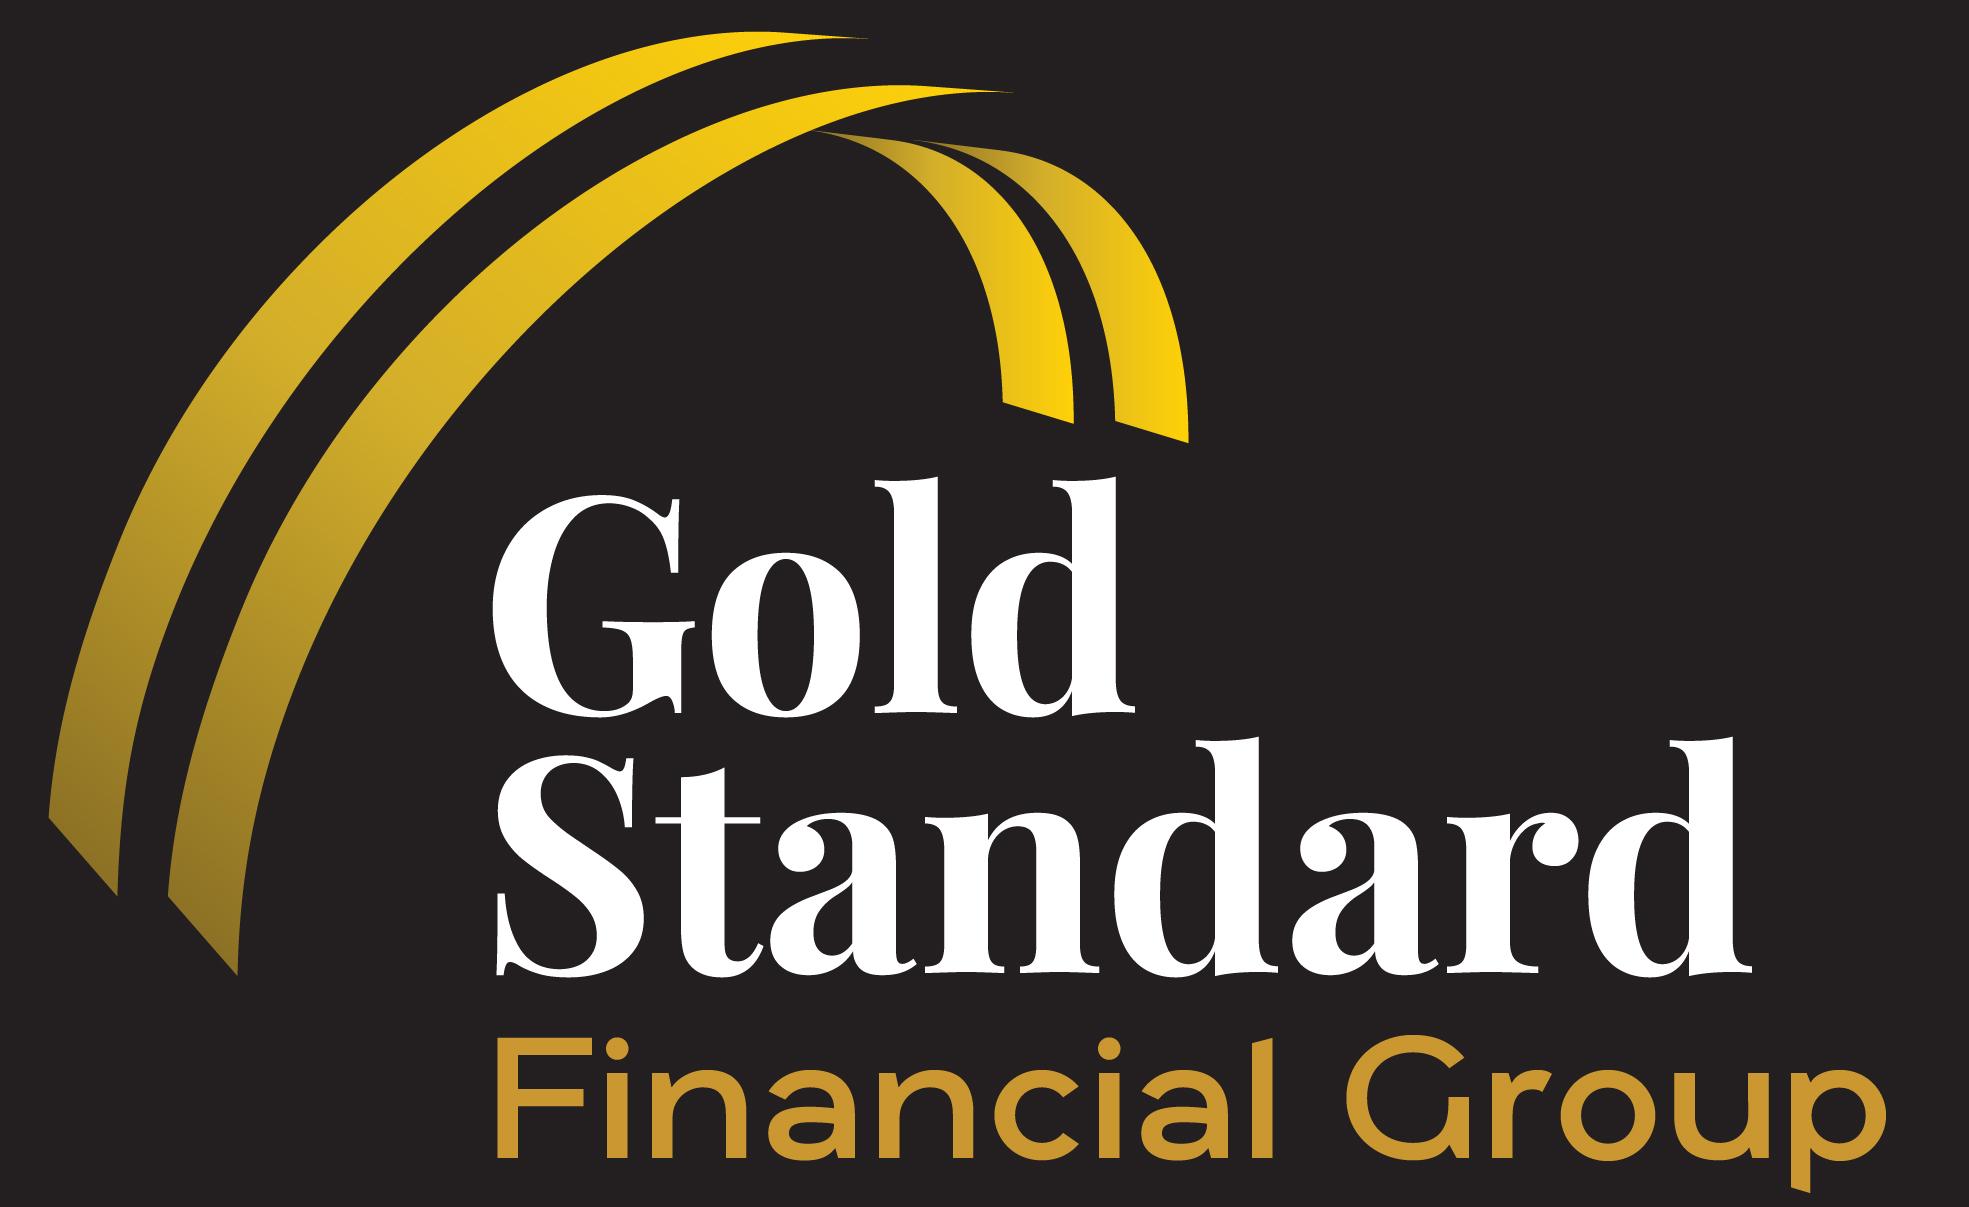 Brian Goldman Retirement Planning Solutions